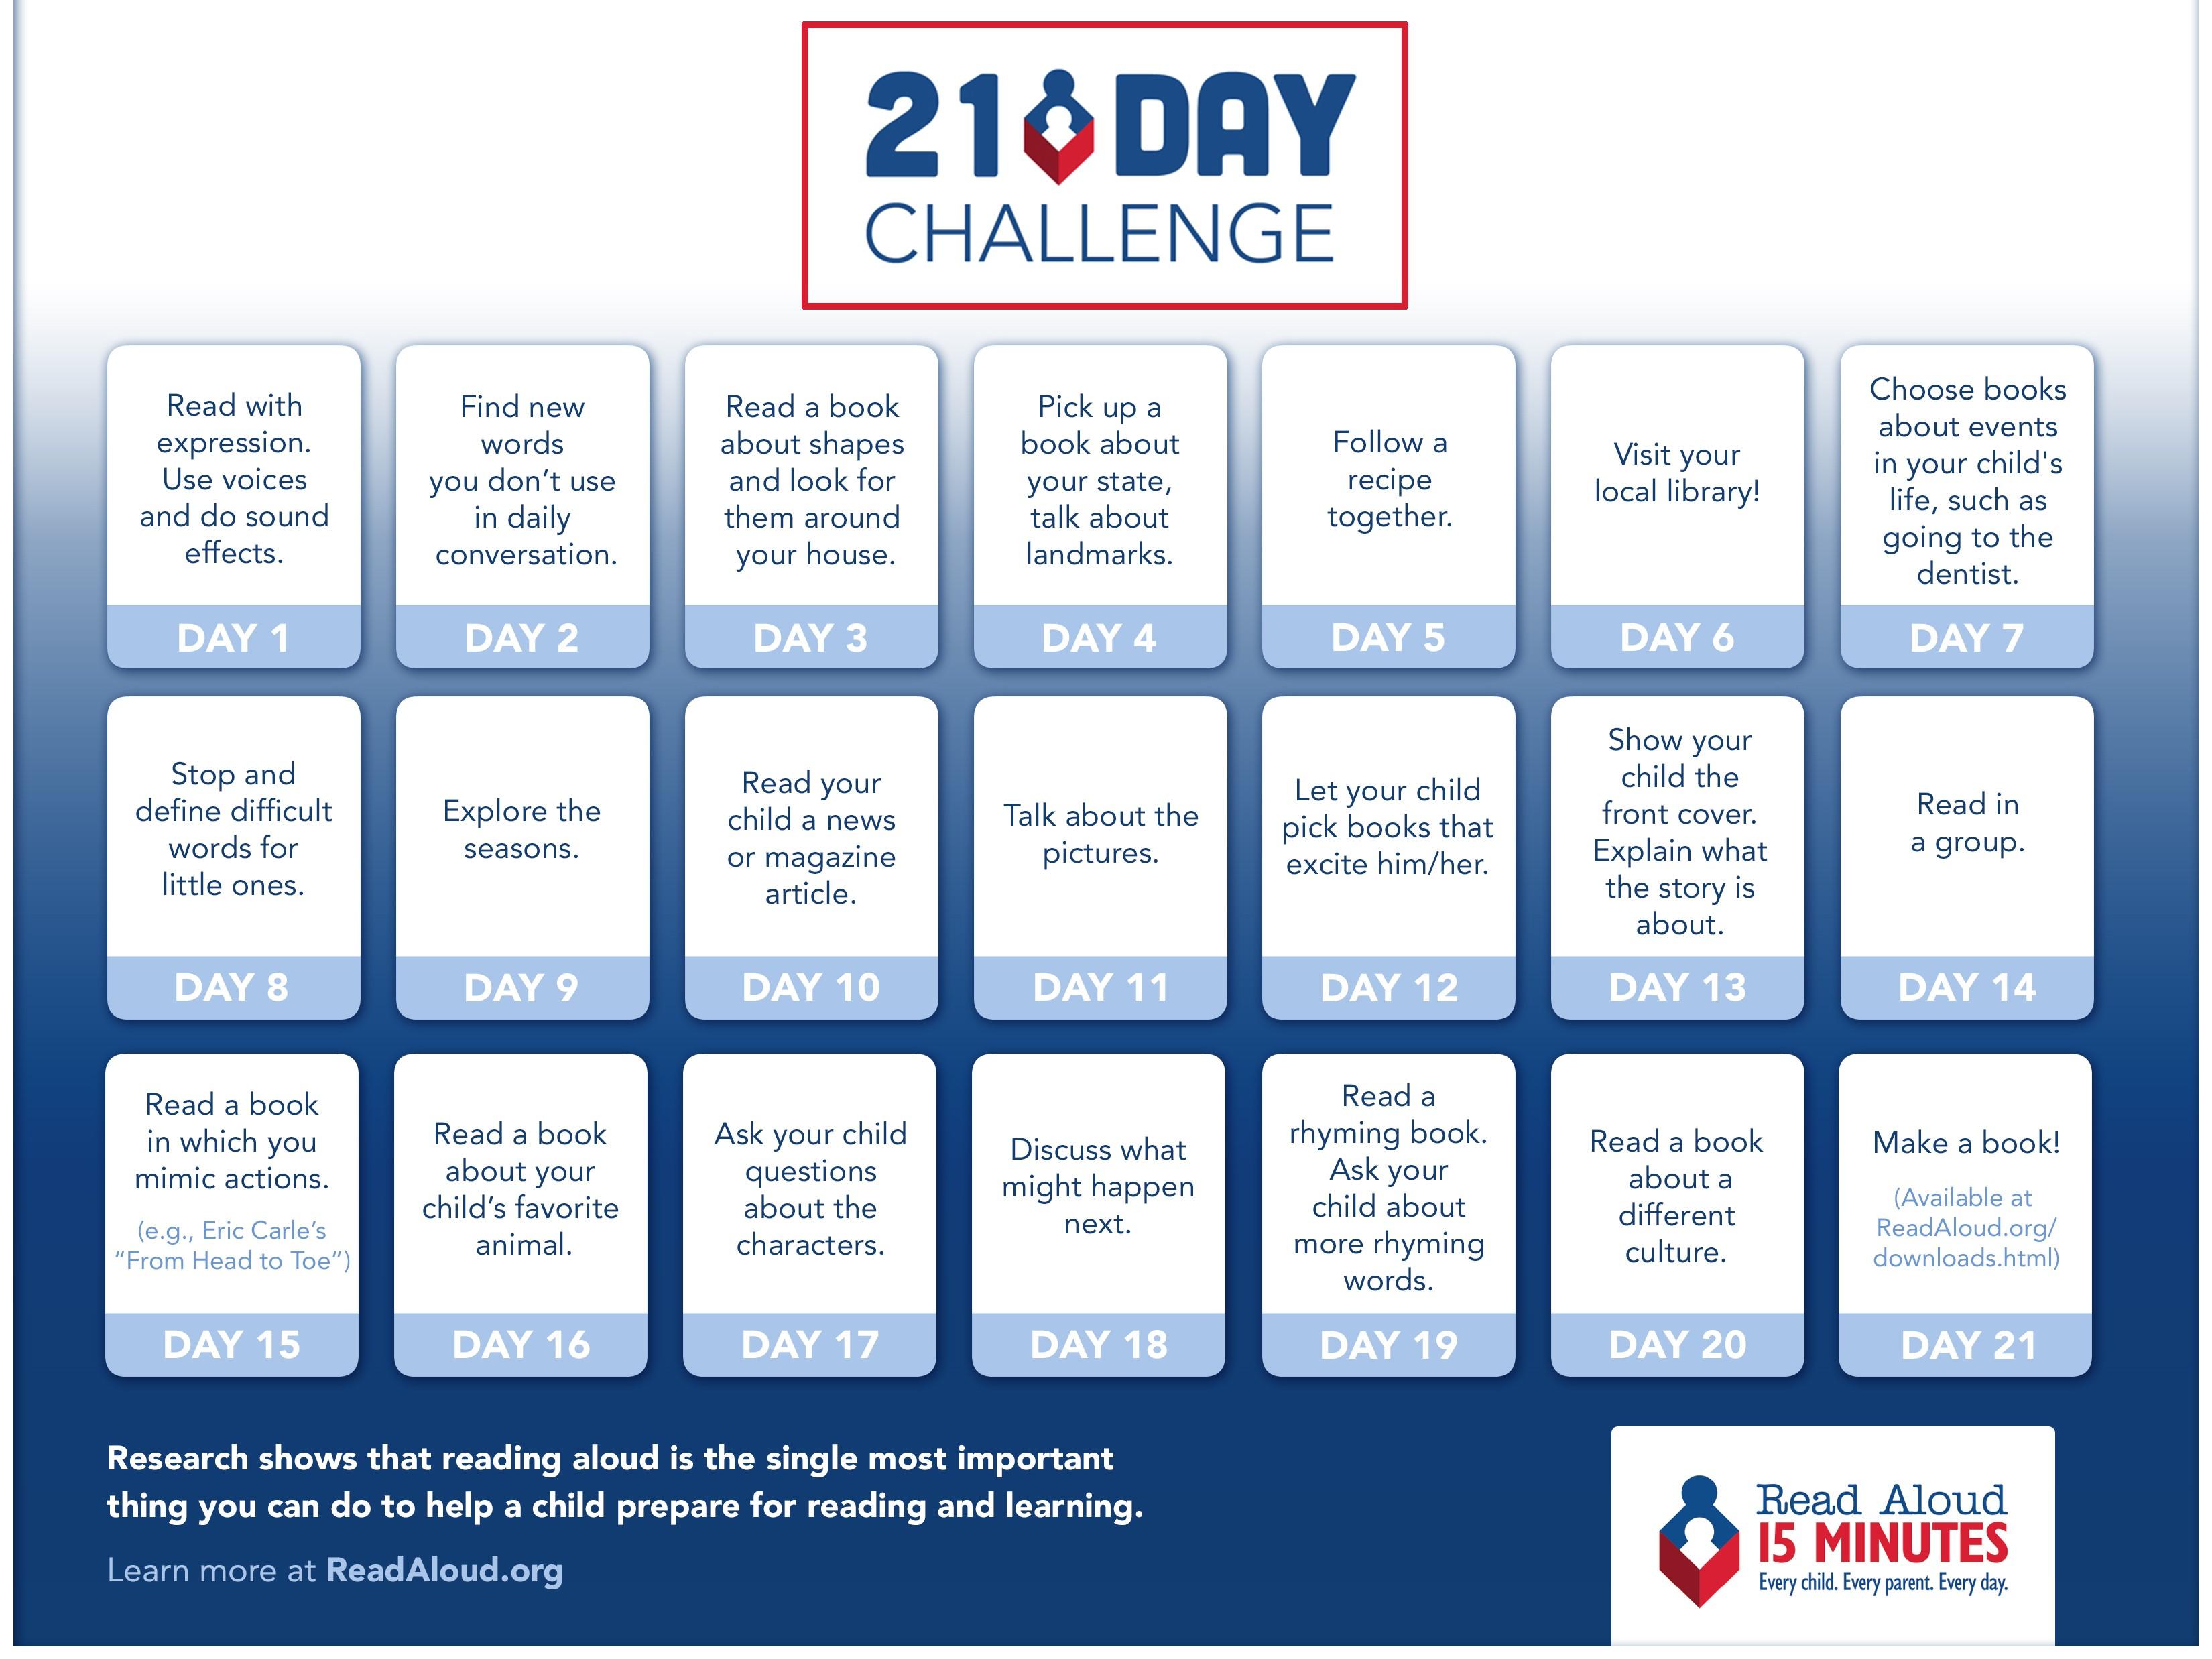 21daychallenge_calendar use this